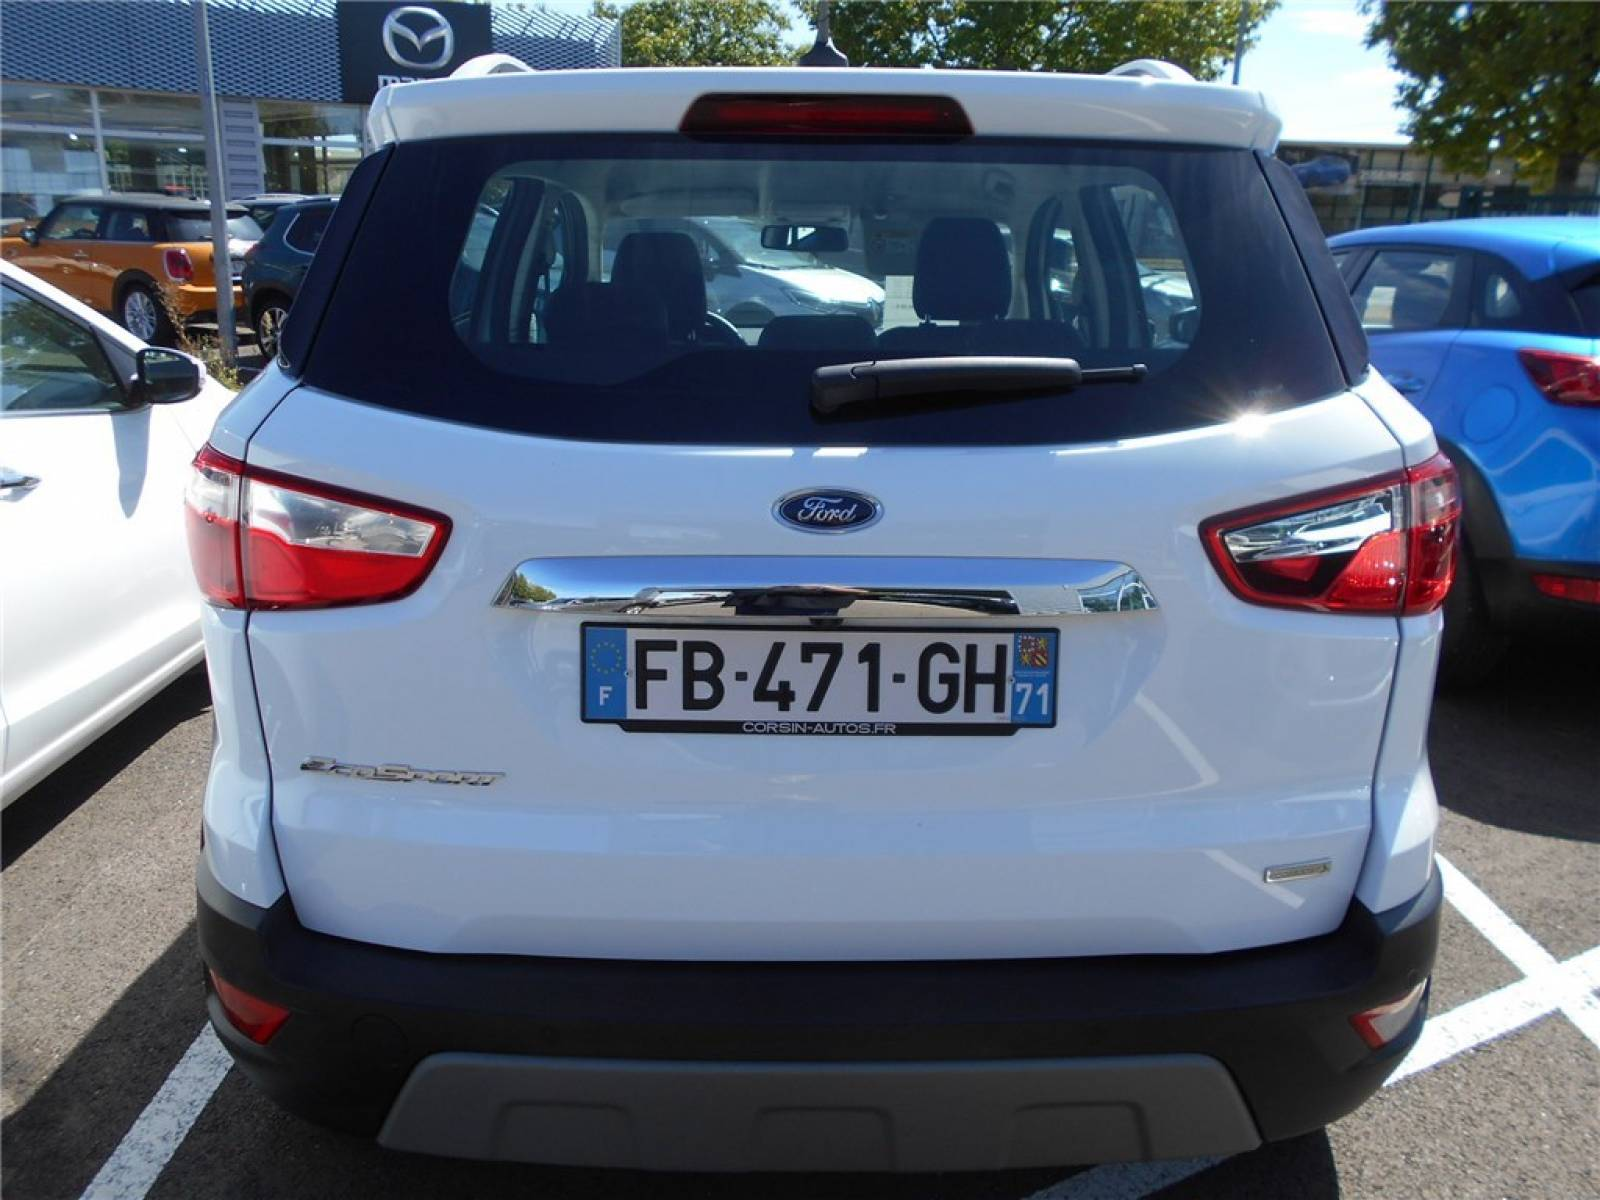 FORD EcoSport 1.0 EcoBoost 125 BVM6 - véhicule d'occasion - Groupe Guillet - Chalon Automobiles - 71100 - Chalon-sur-Saône - 9